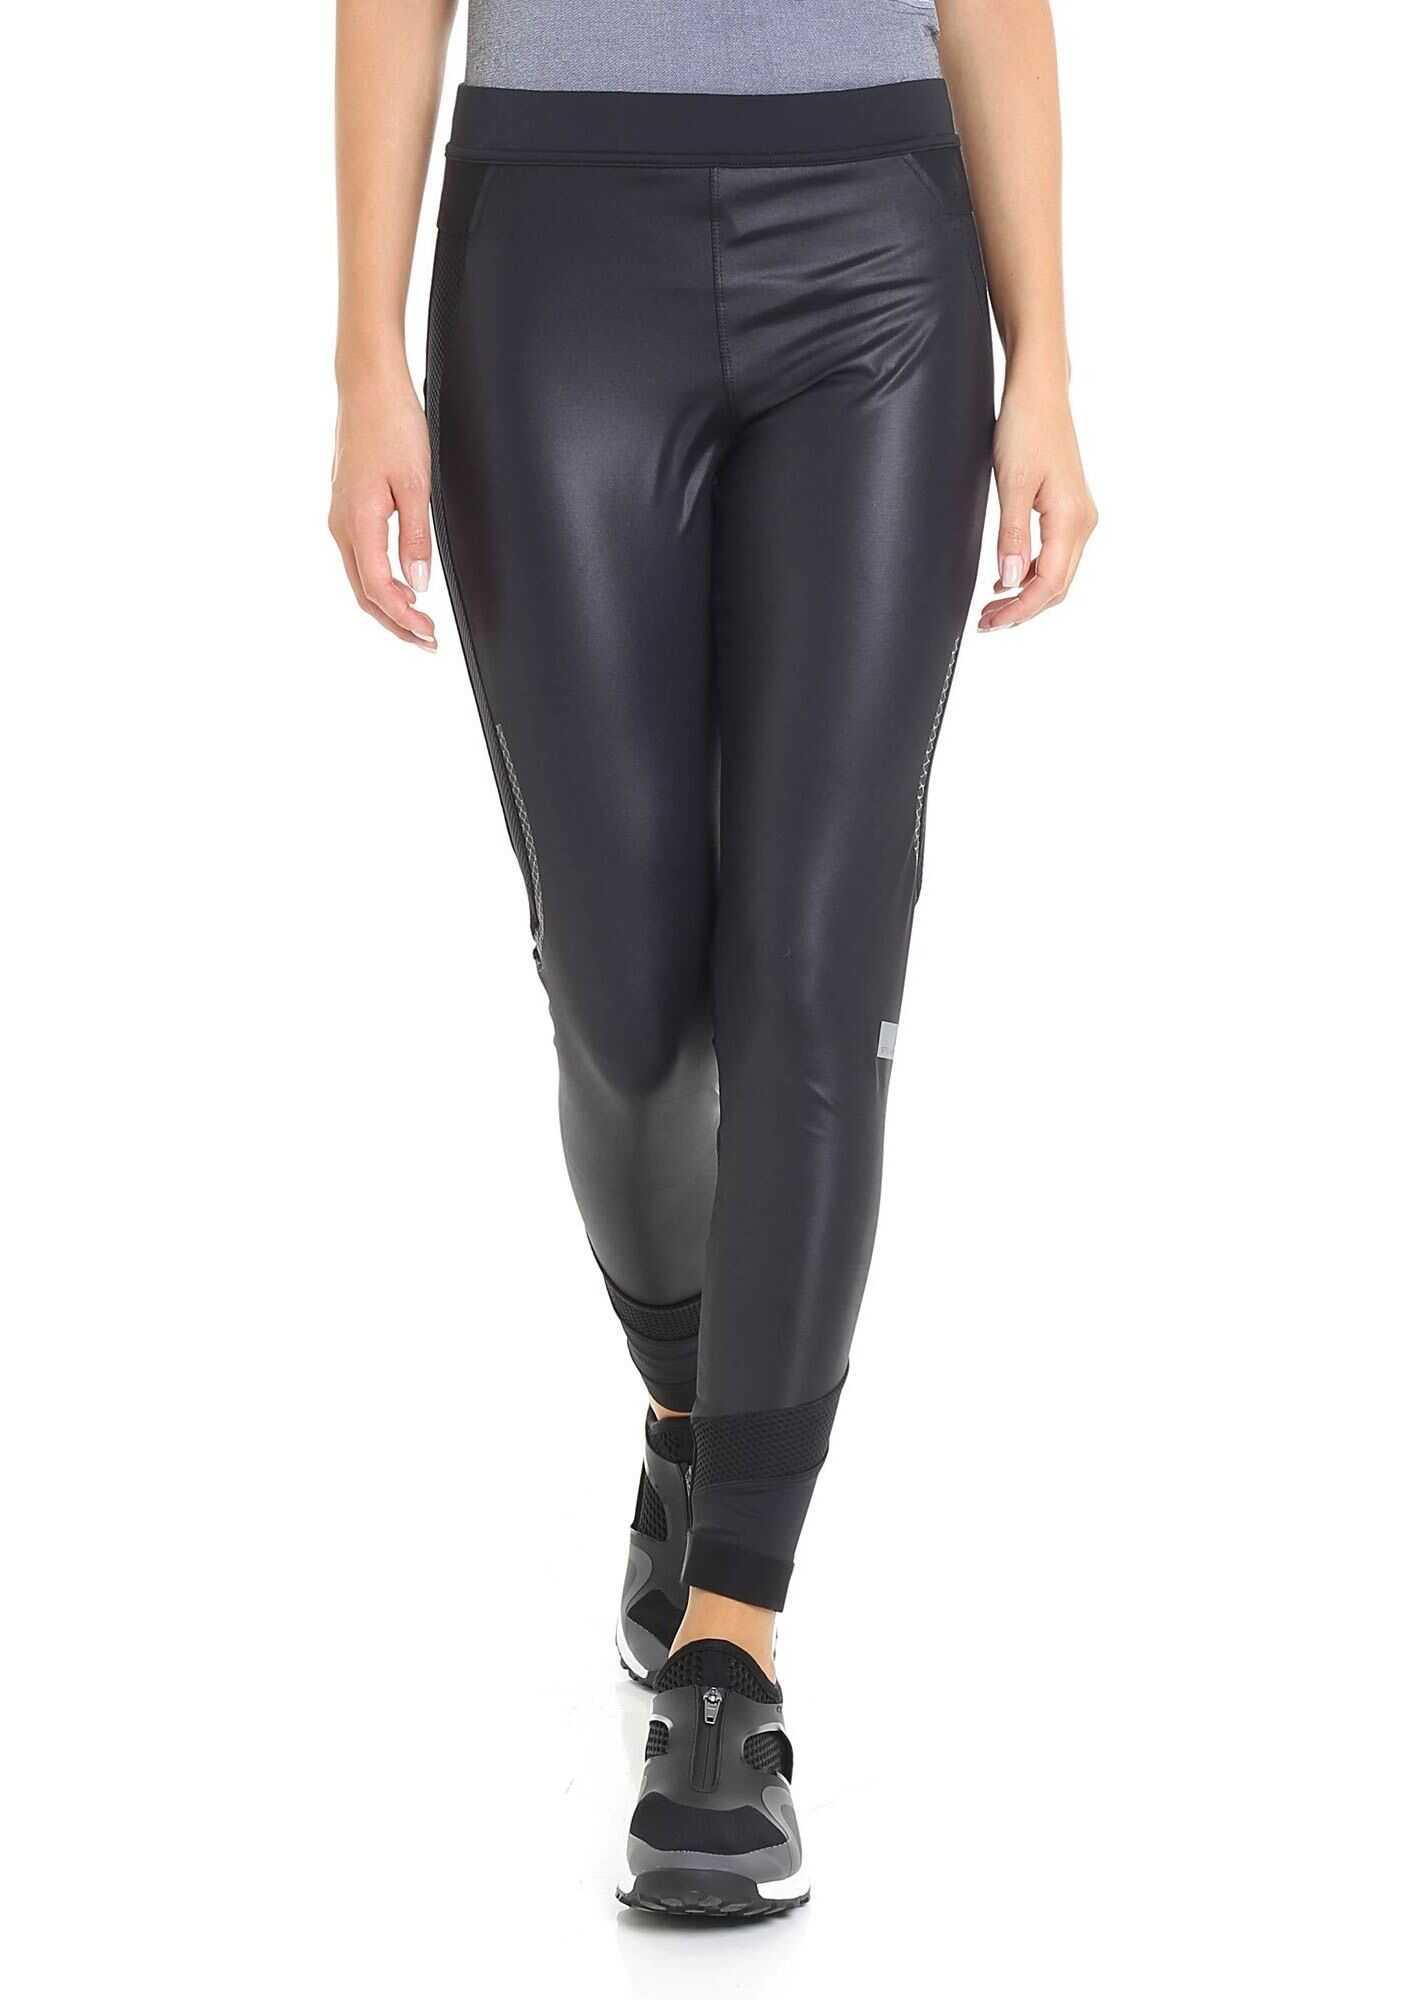 adidas by Stella McCartney Black Leggings With Waist Branded Band Black